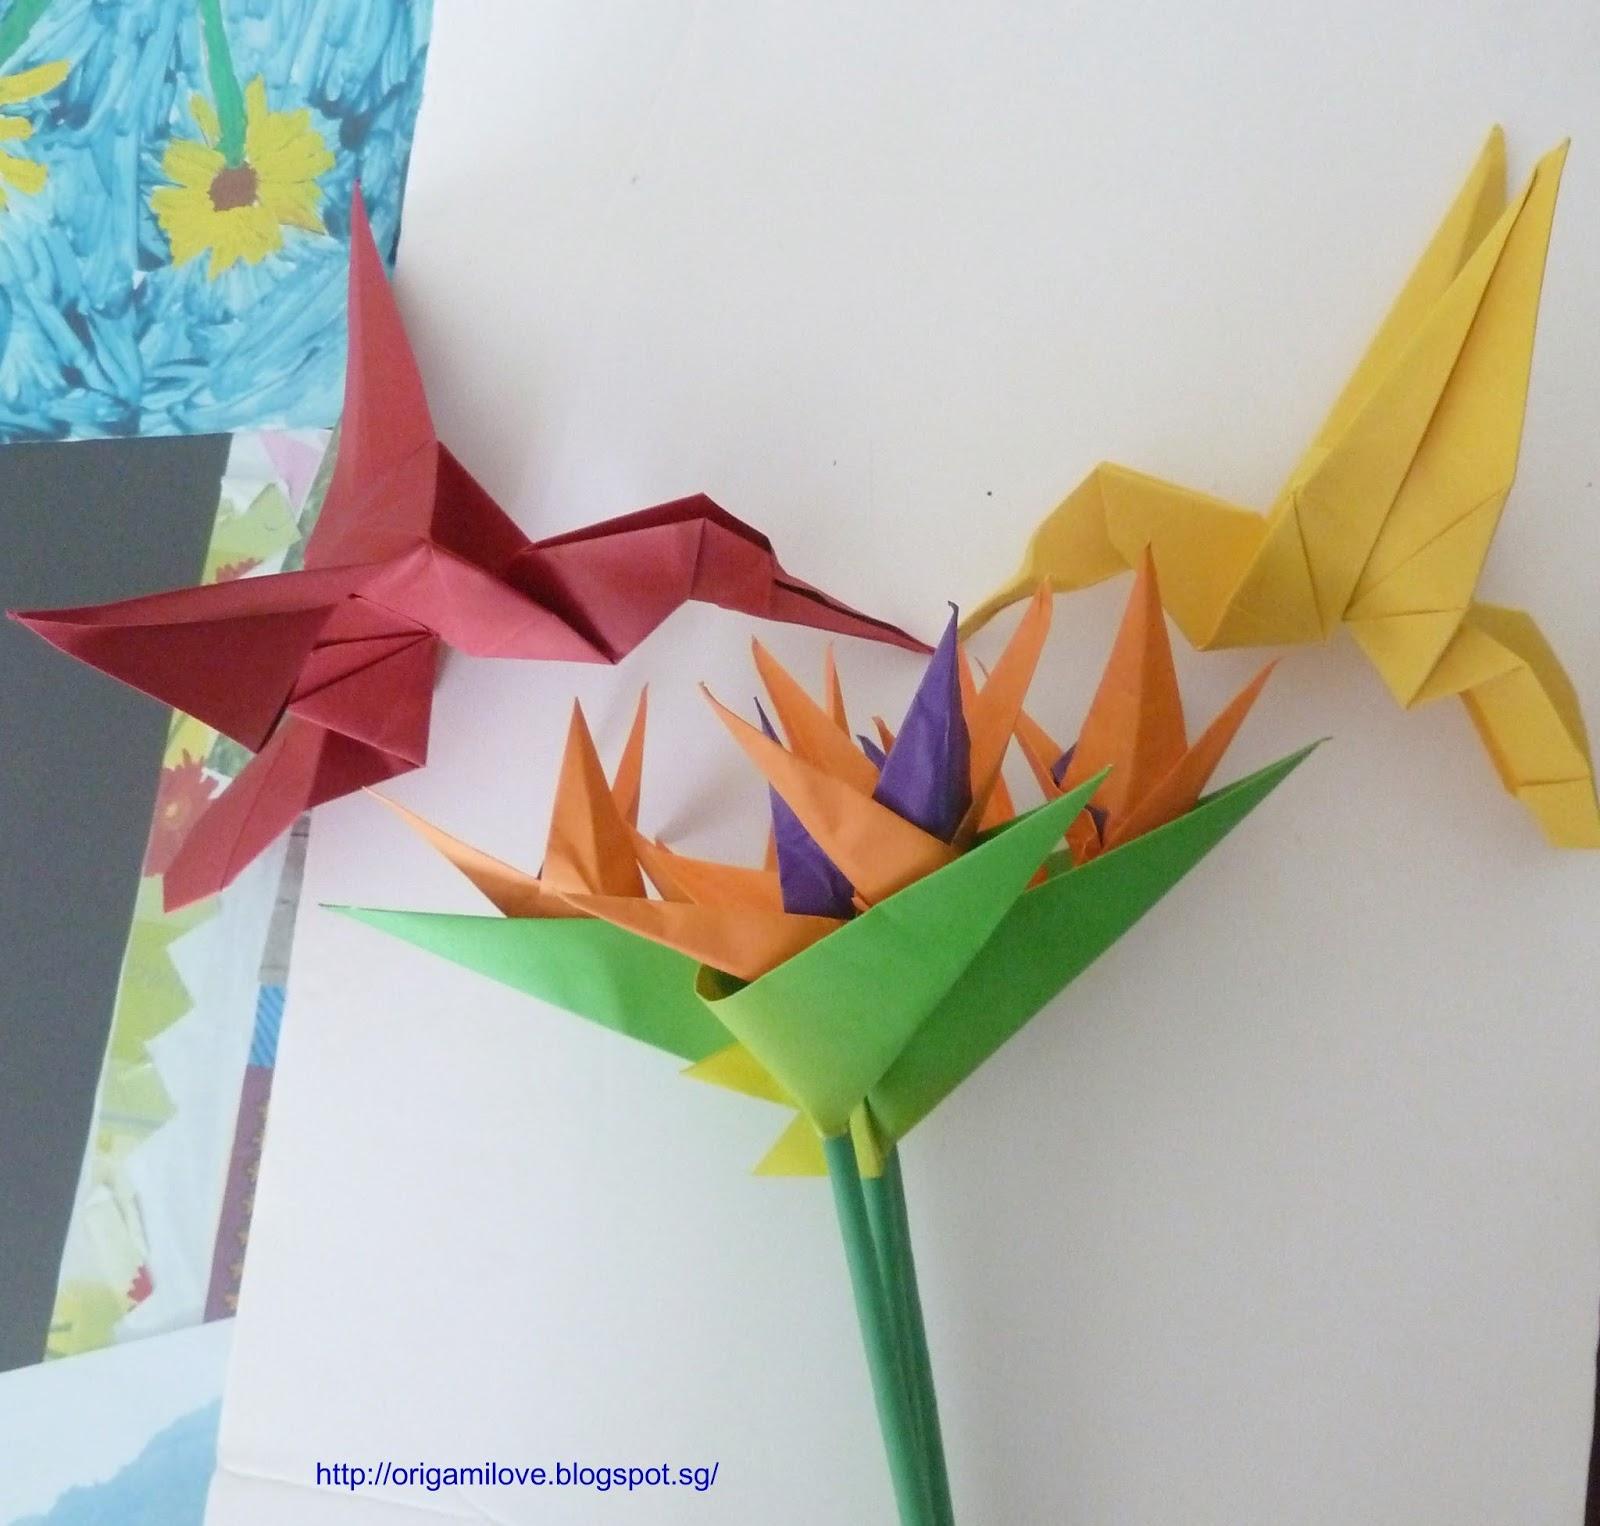 Origami Hummingbird Diagram Instructions Baldor Motor Wiring Single Phase Bird Of Paradise Flower Tutorial